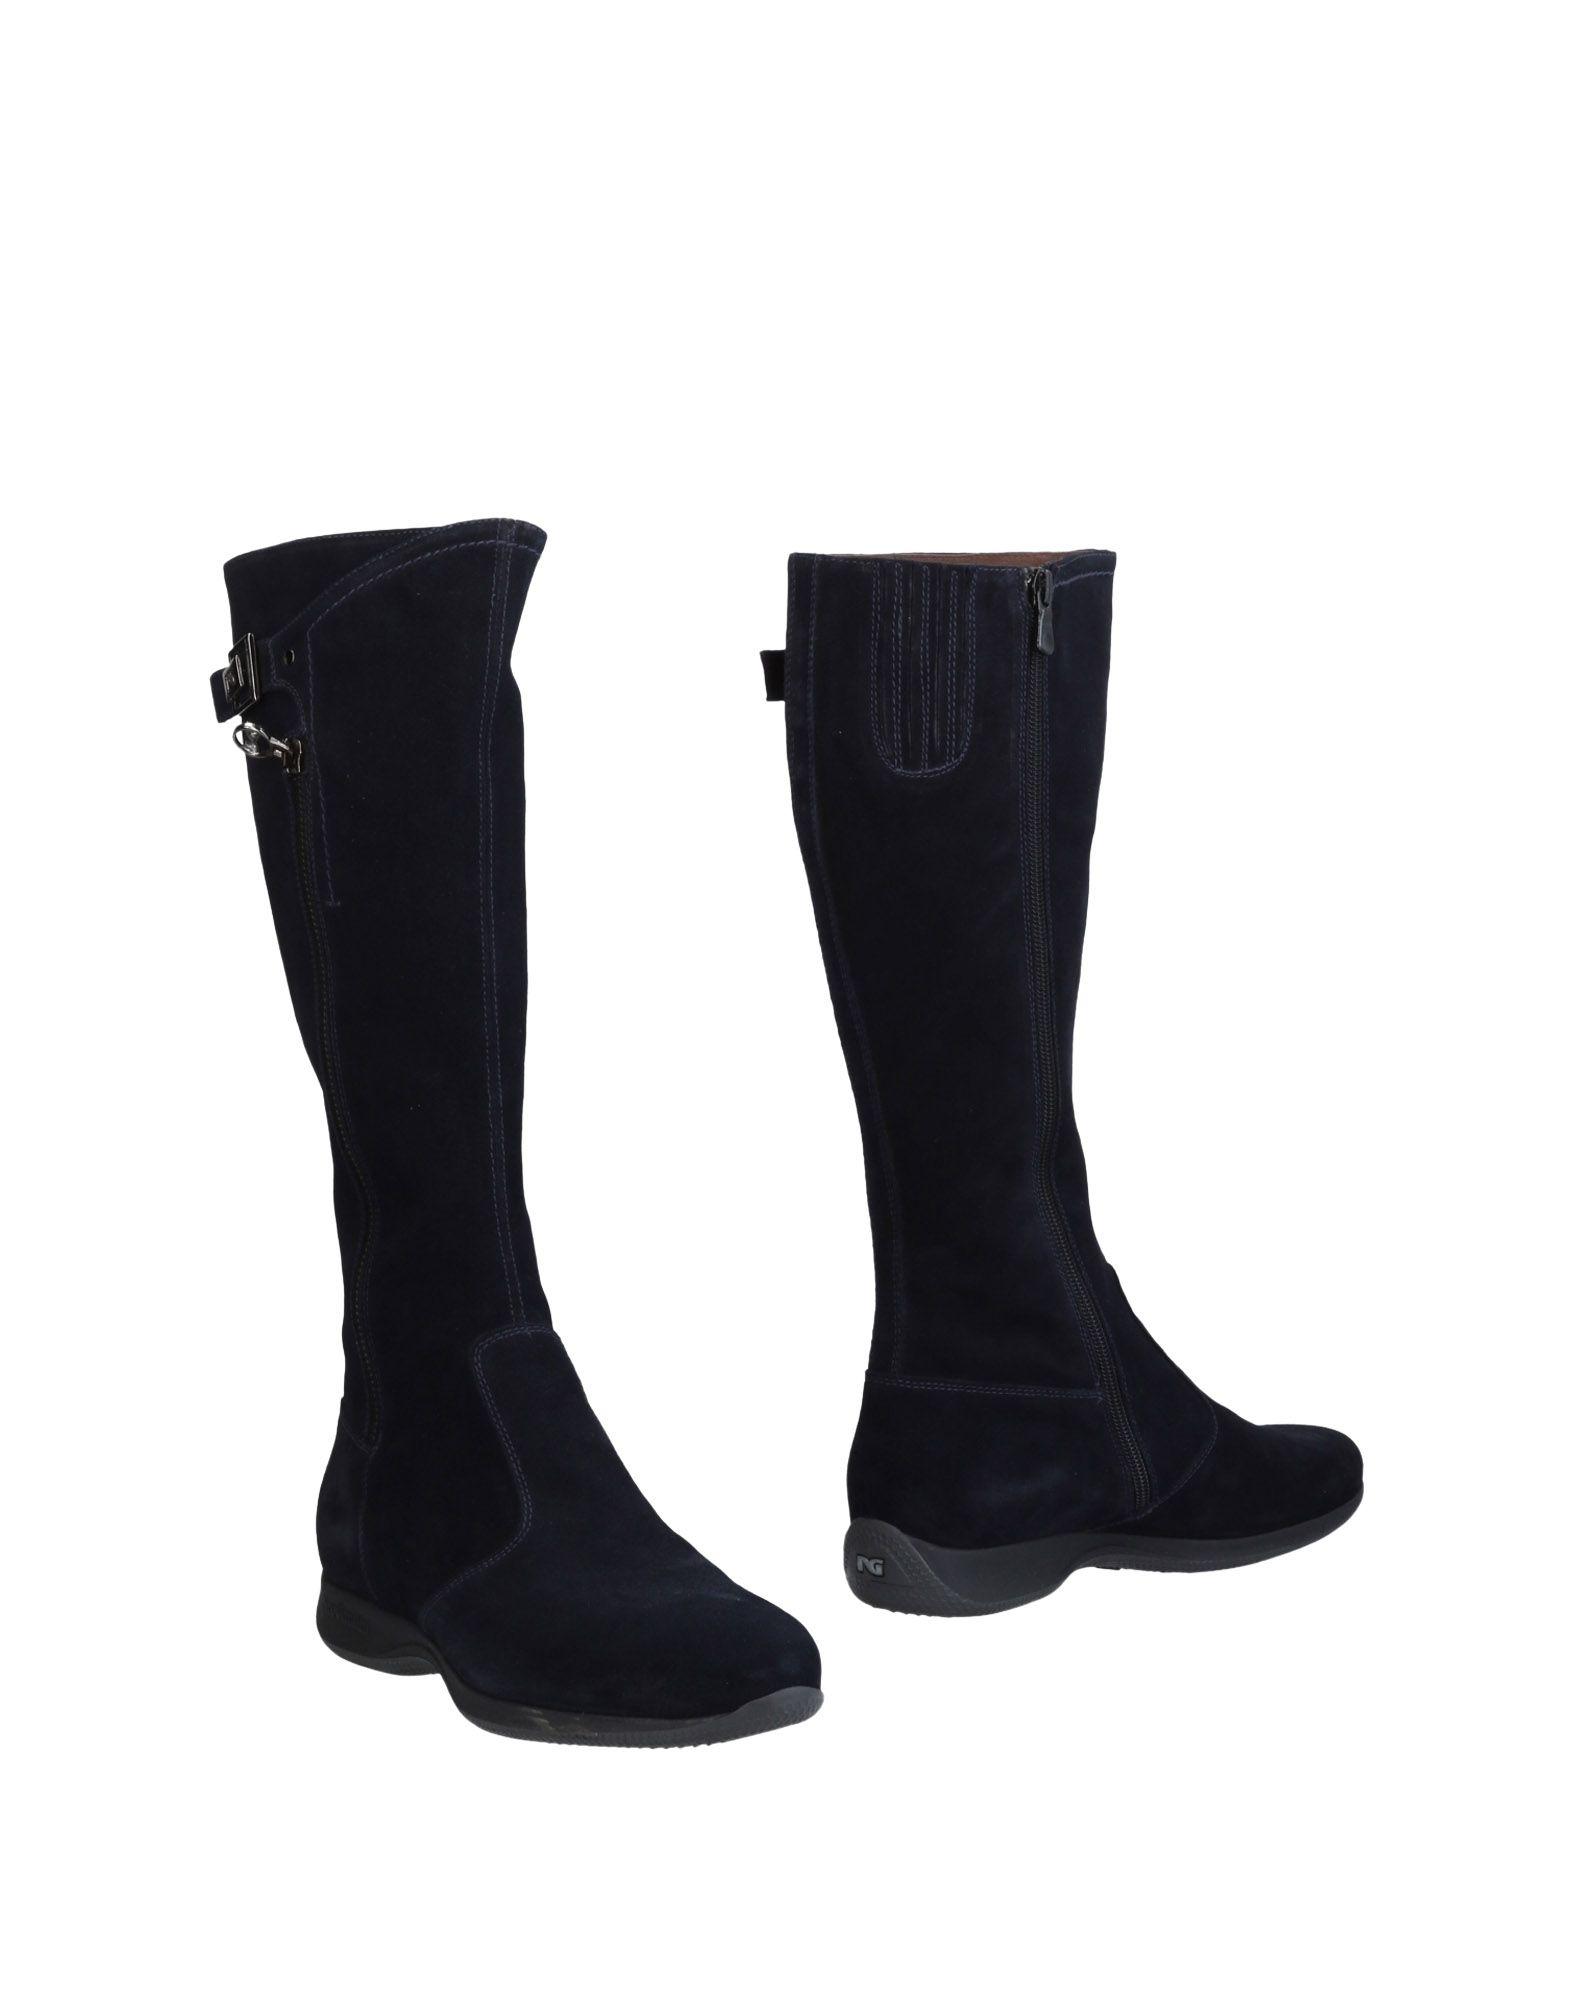 Ng Nero Giardini Boots - Women online Ng Nero Giardini Boots online Women on  United Kingdom - 11458995BX 7a7596